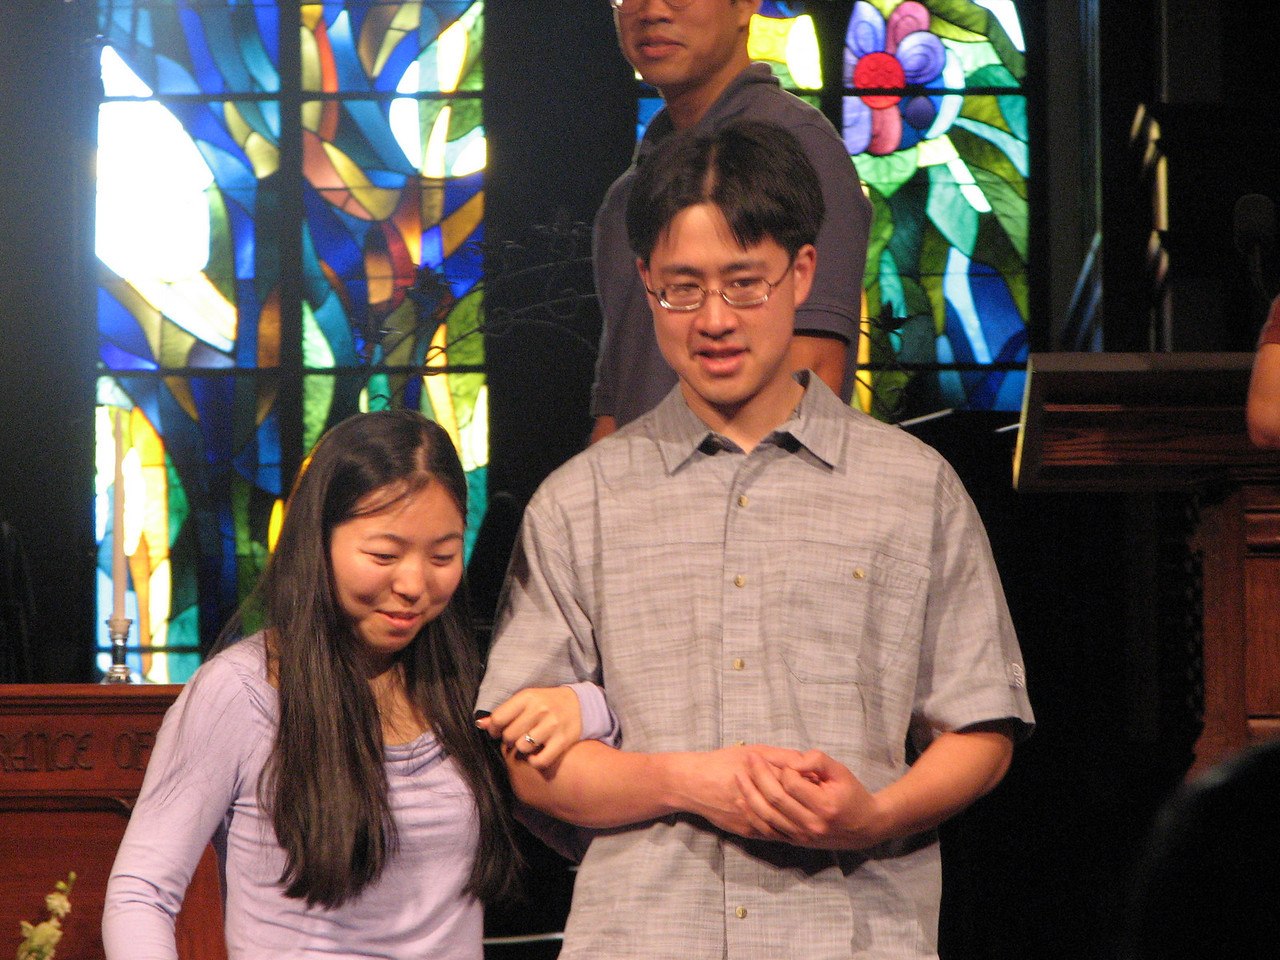 2007 05 18 Fri - Rehearsal - Cynthia Cheung & Stephen Chang 2